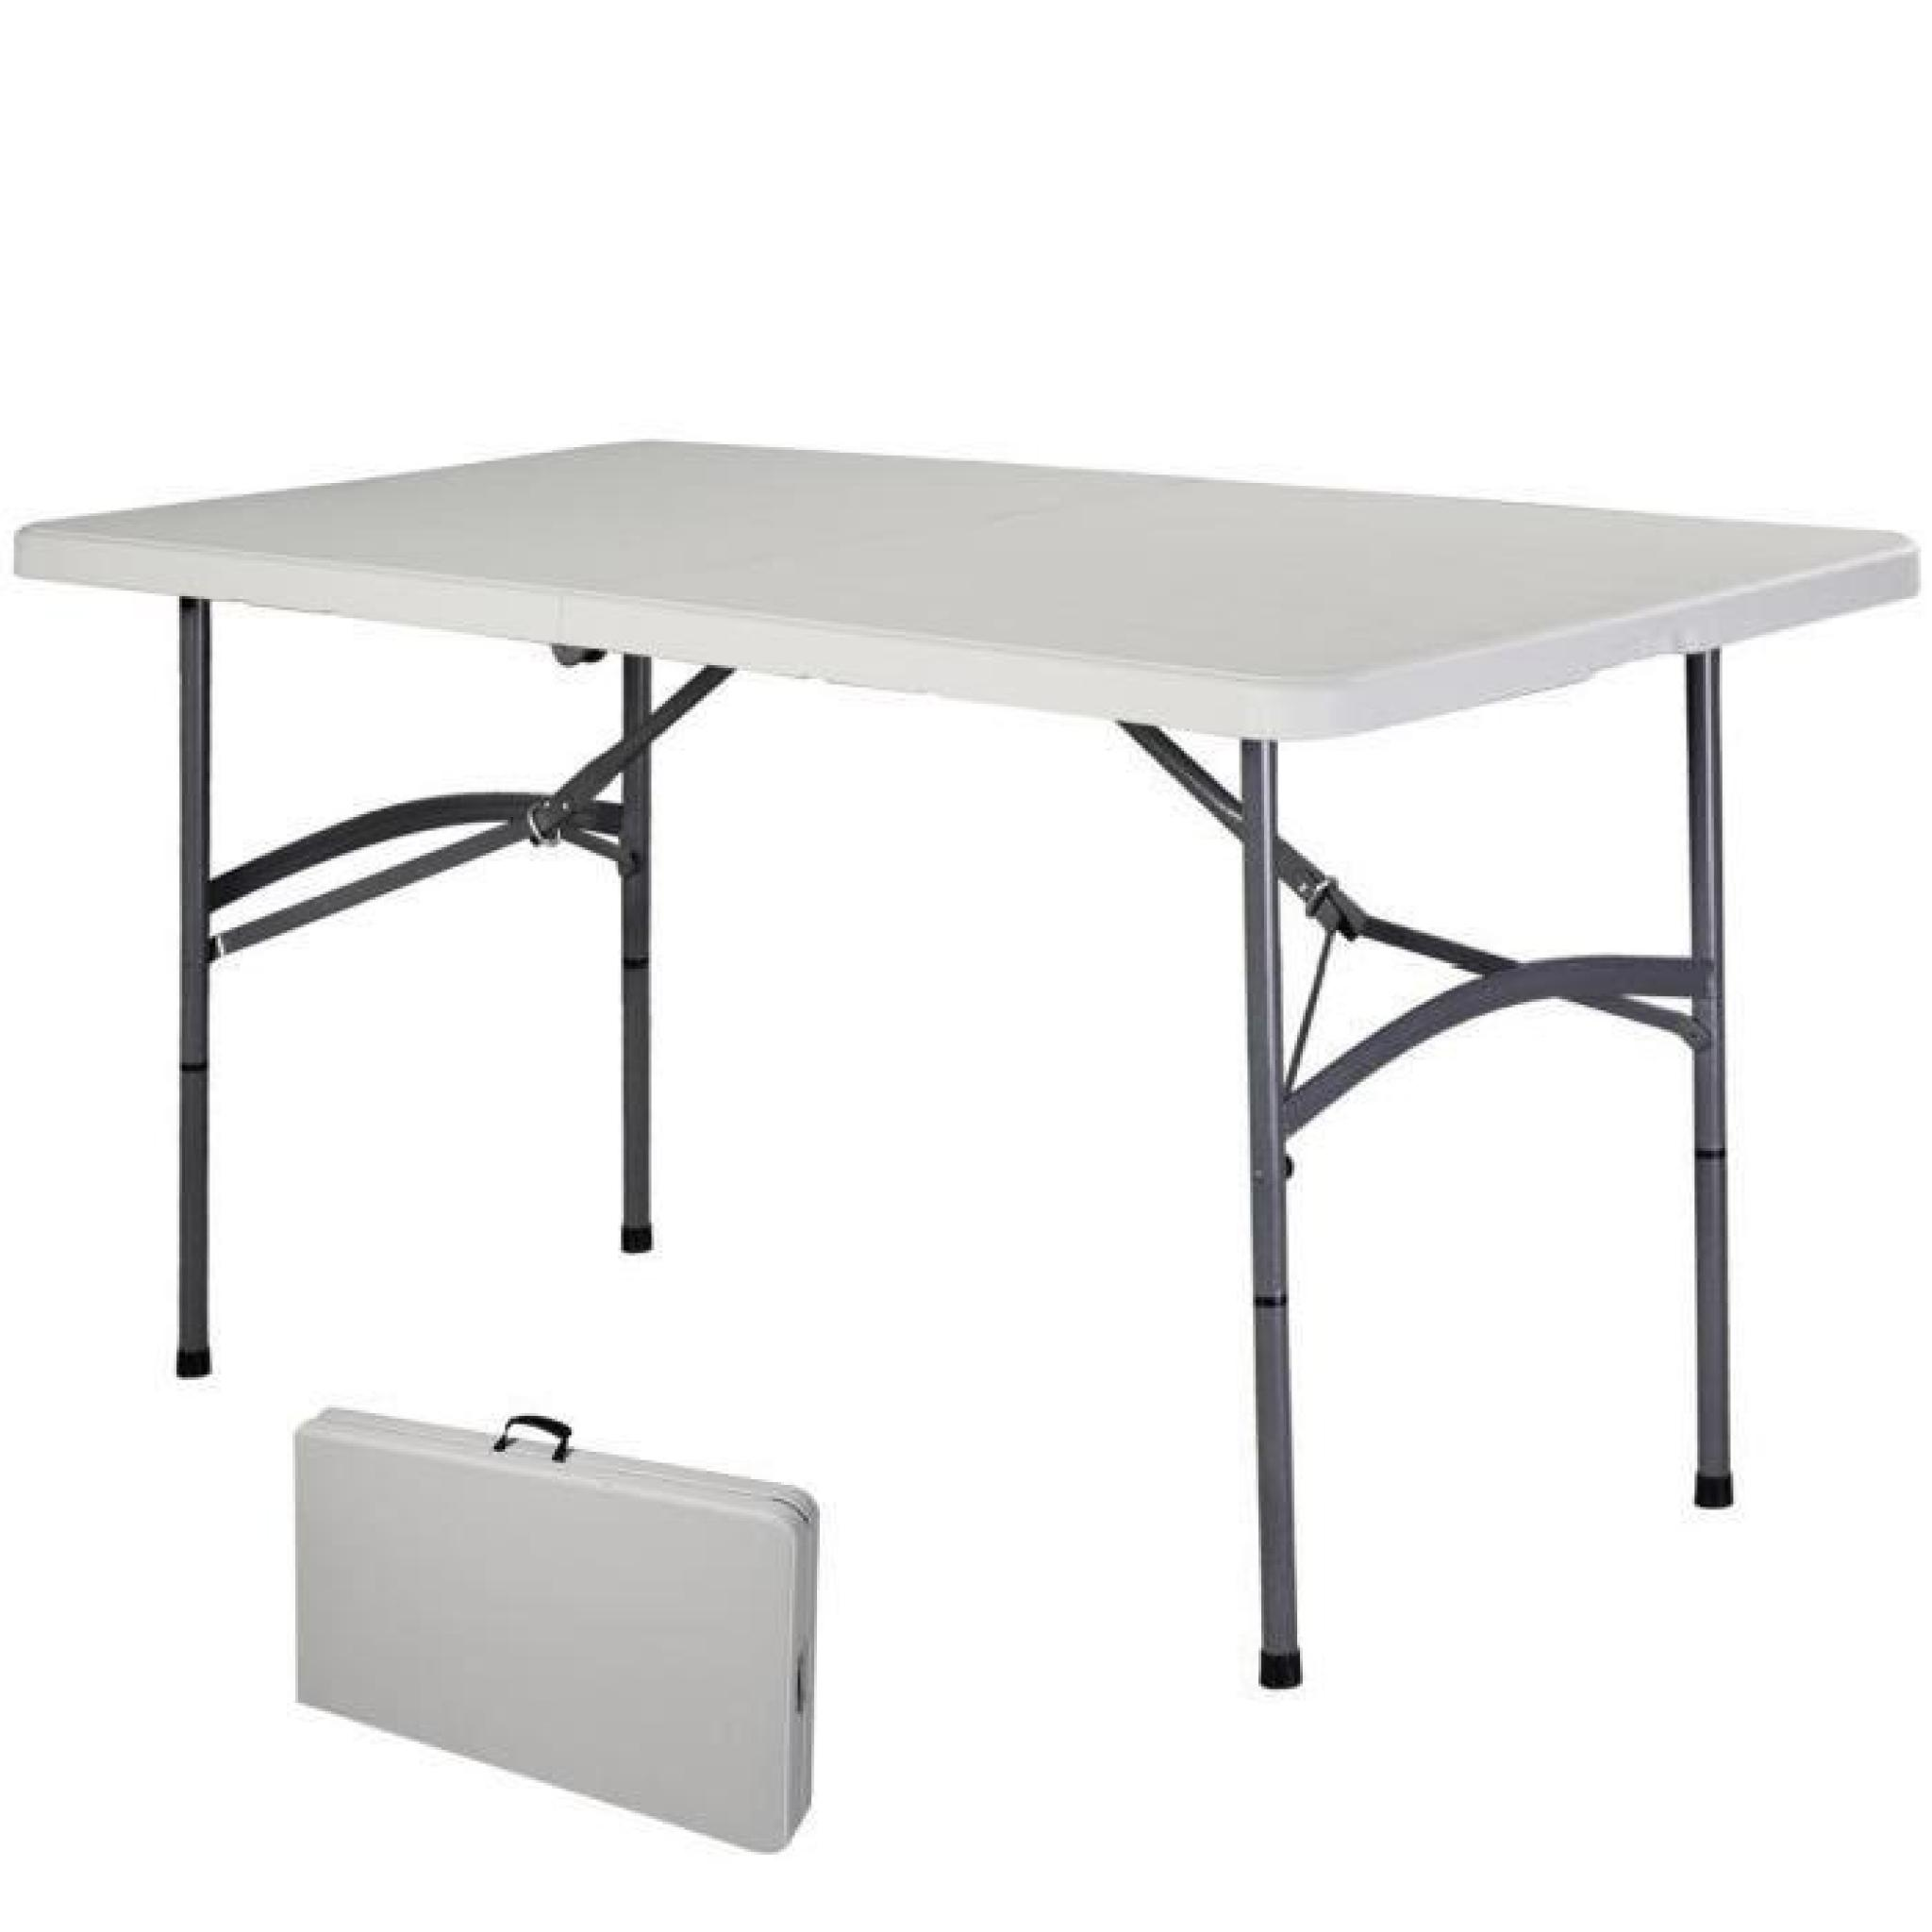 Table pliante portable table de camping valise jardin 122cm